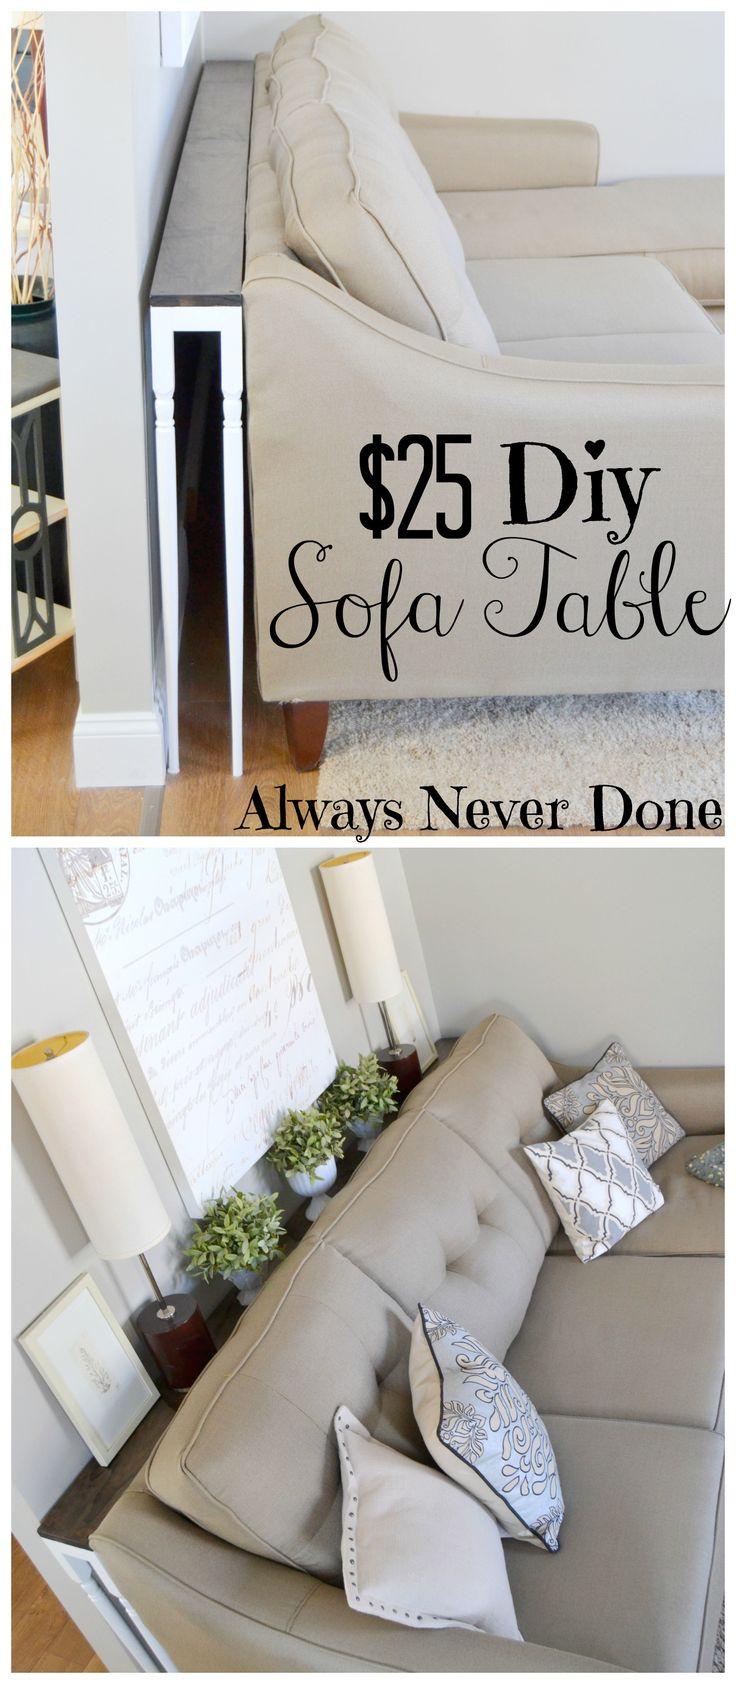 Groovy Diy Crafts Diy Sofa Table For 25 Using Stair Rails As Ibusinesslaw Wood Chair Design Ideas Ibusinesslaworg